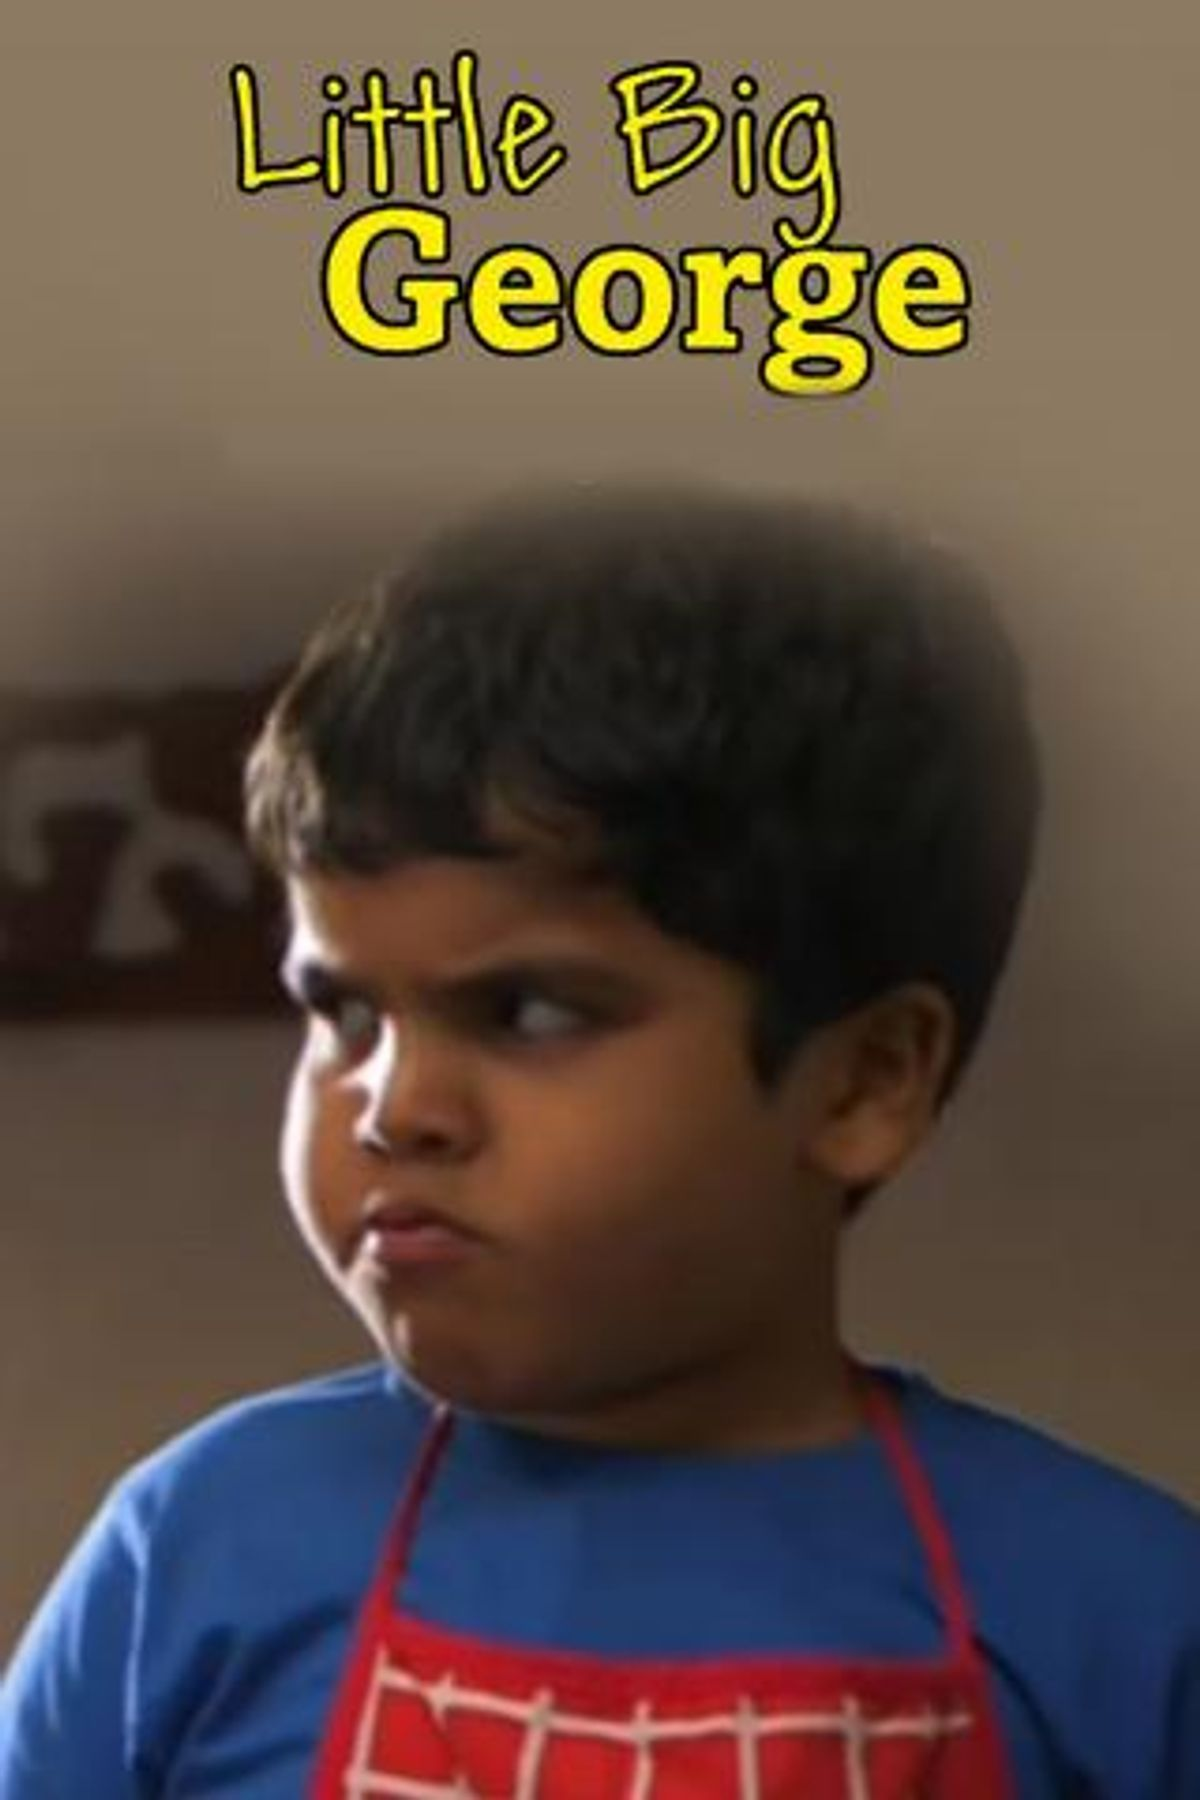 Little Big George